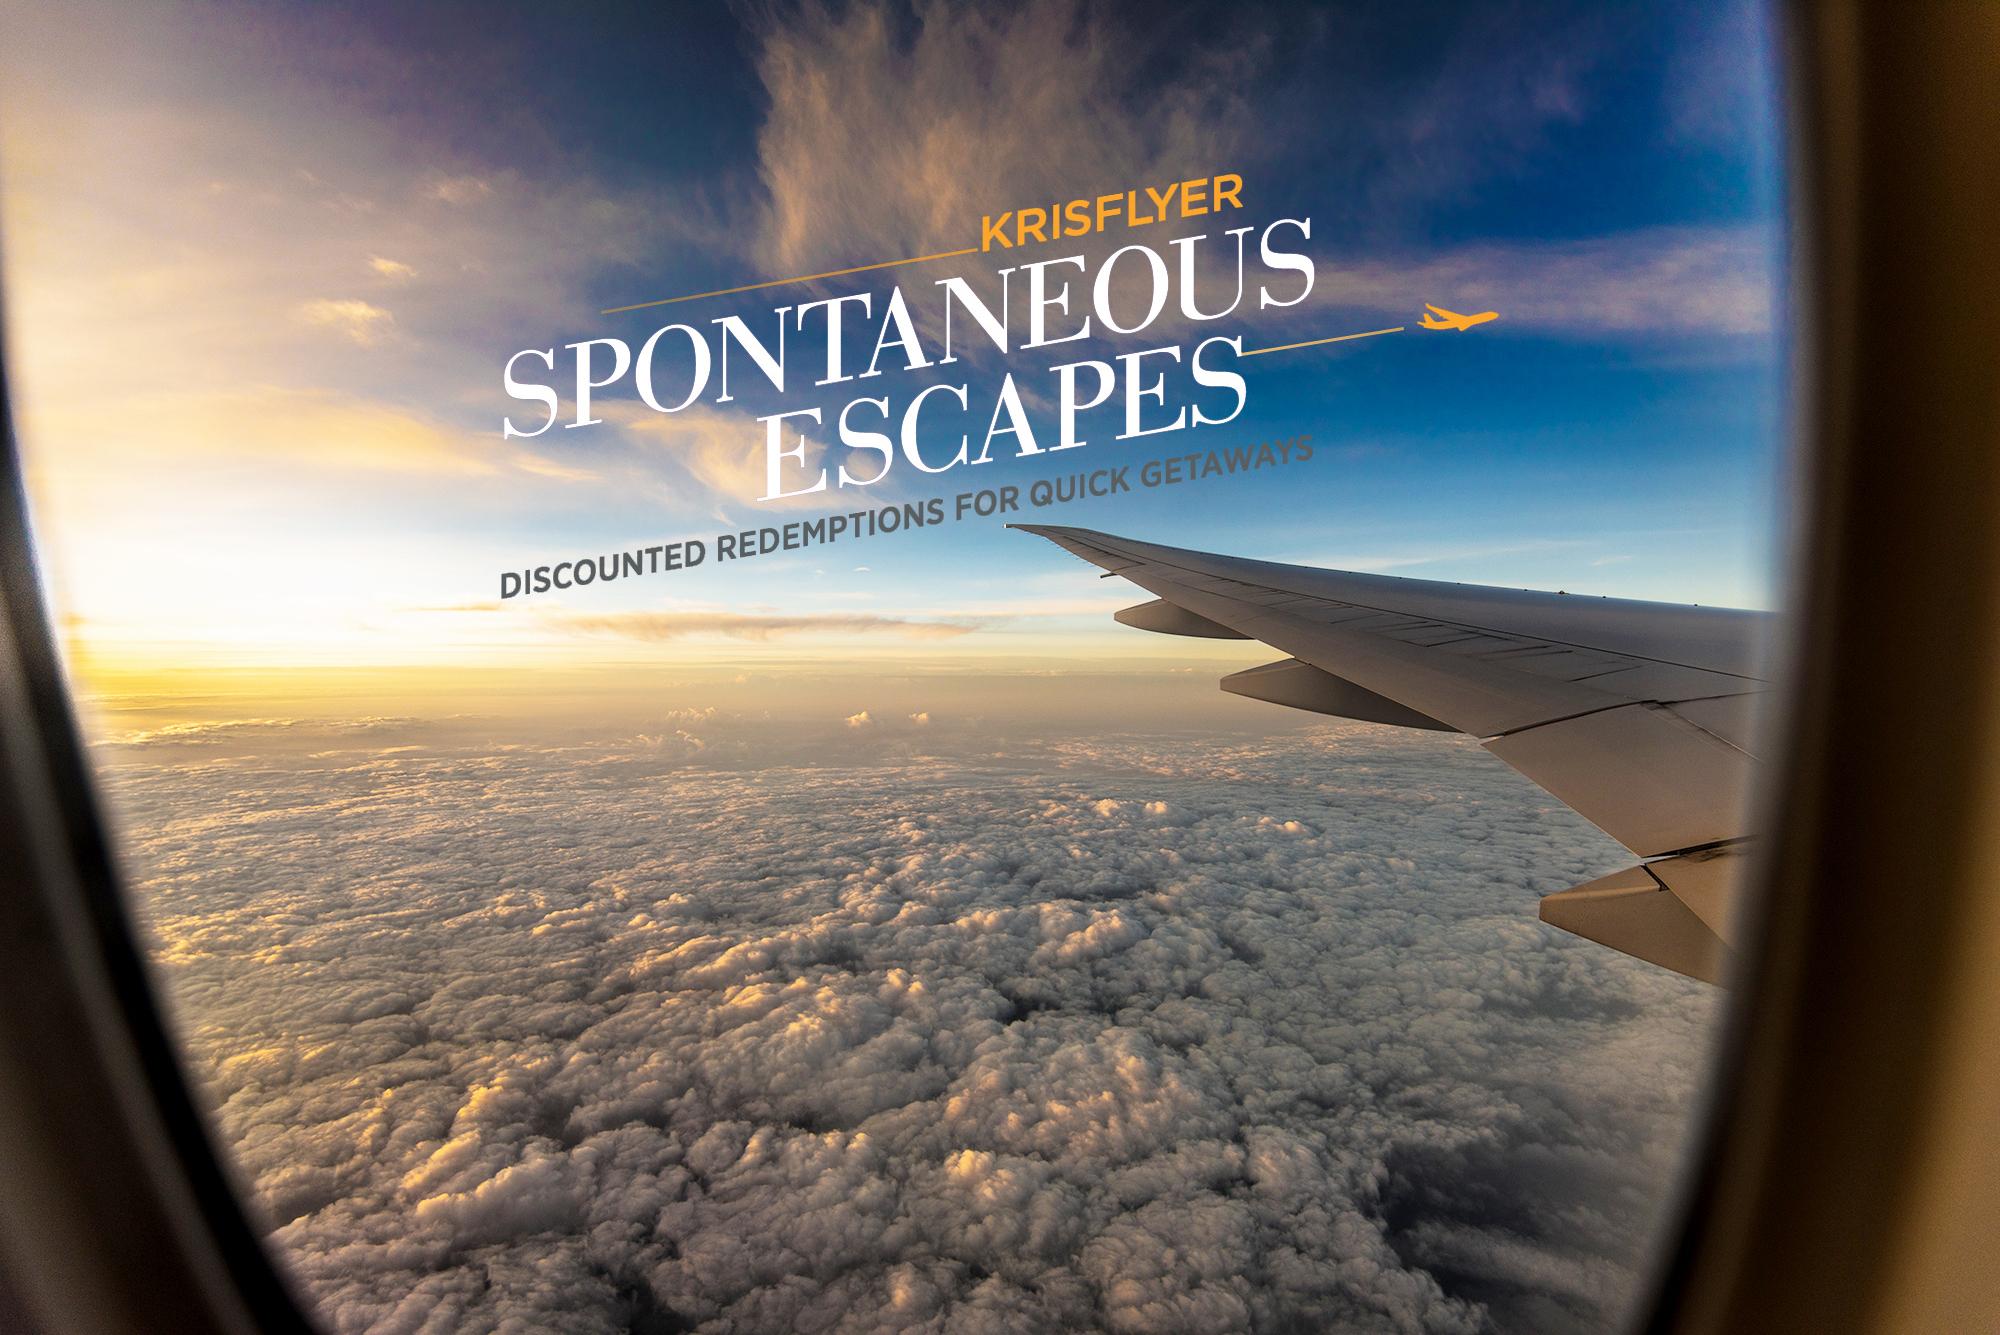 KrisFlyer Spontaneous Escapes September 2019 offers